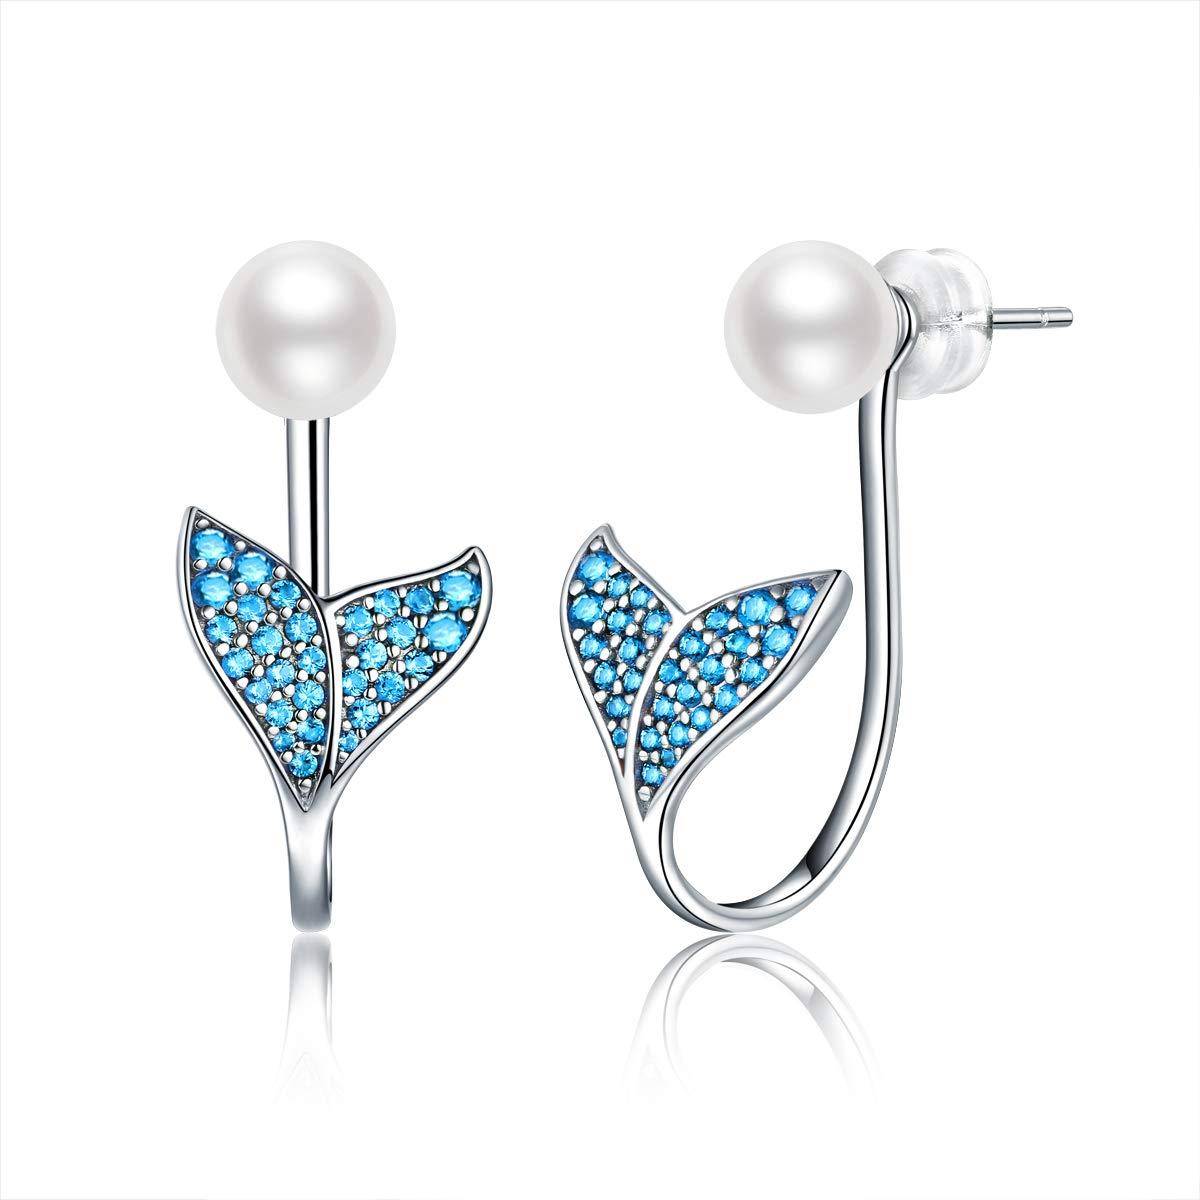 Silver Earrings for Women, Mermaid Tail Earrings 925 Sterling Silver, Hypoallergenic Drop Earrings for Girls, Dangle Earrings Fit Birthday Wedding Anniversary Engagement Valentine's Day FQ0026